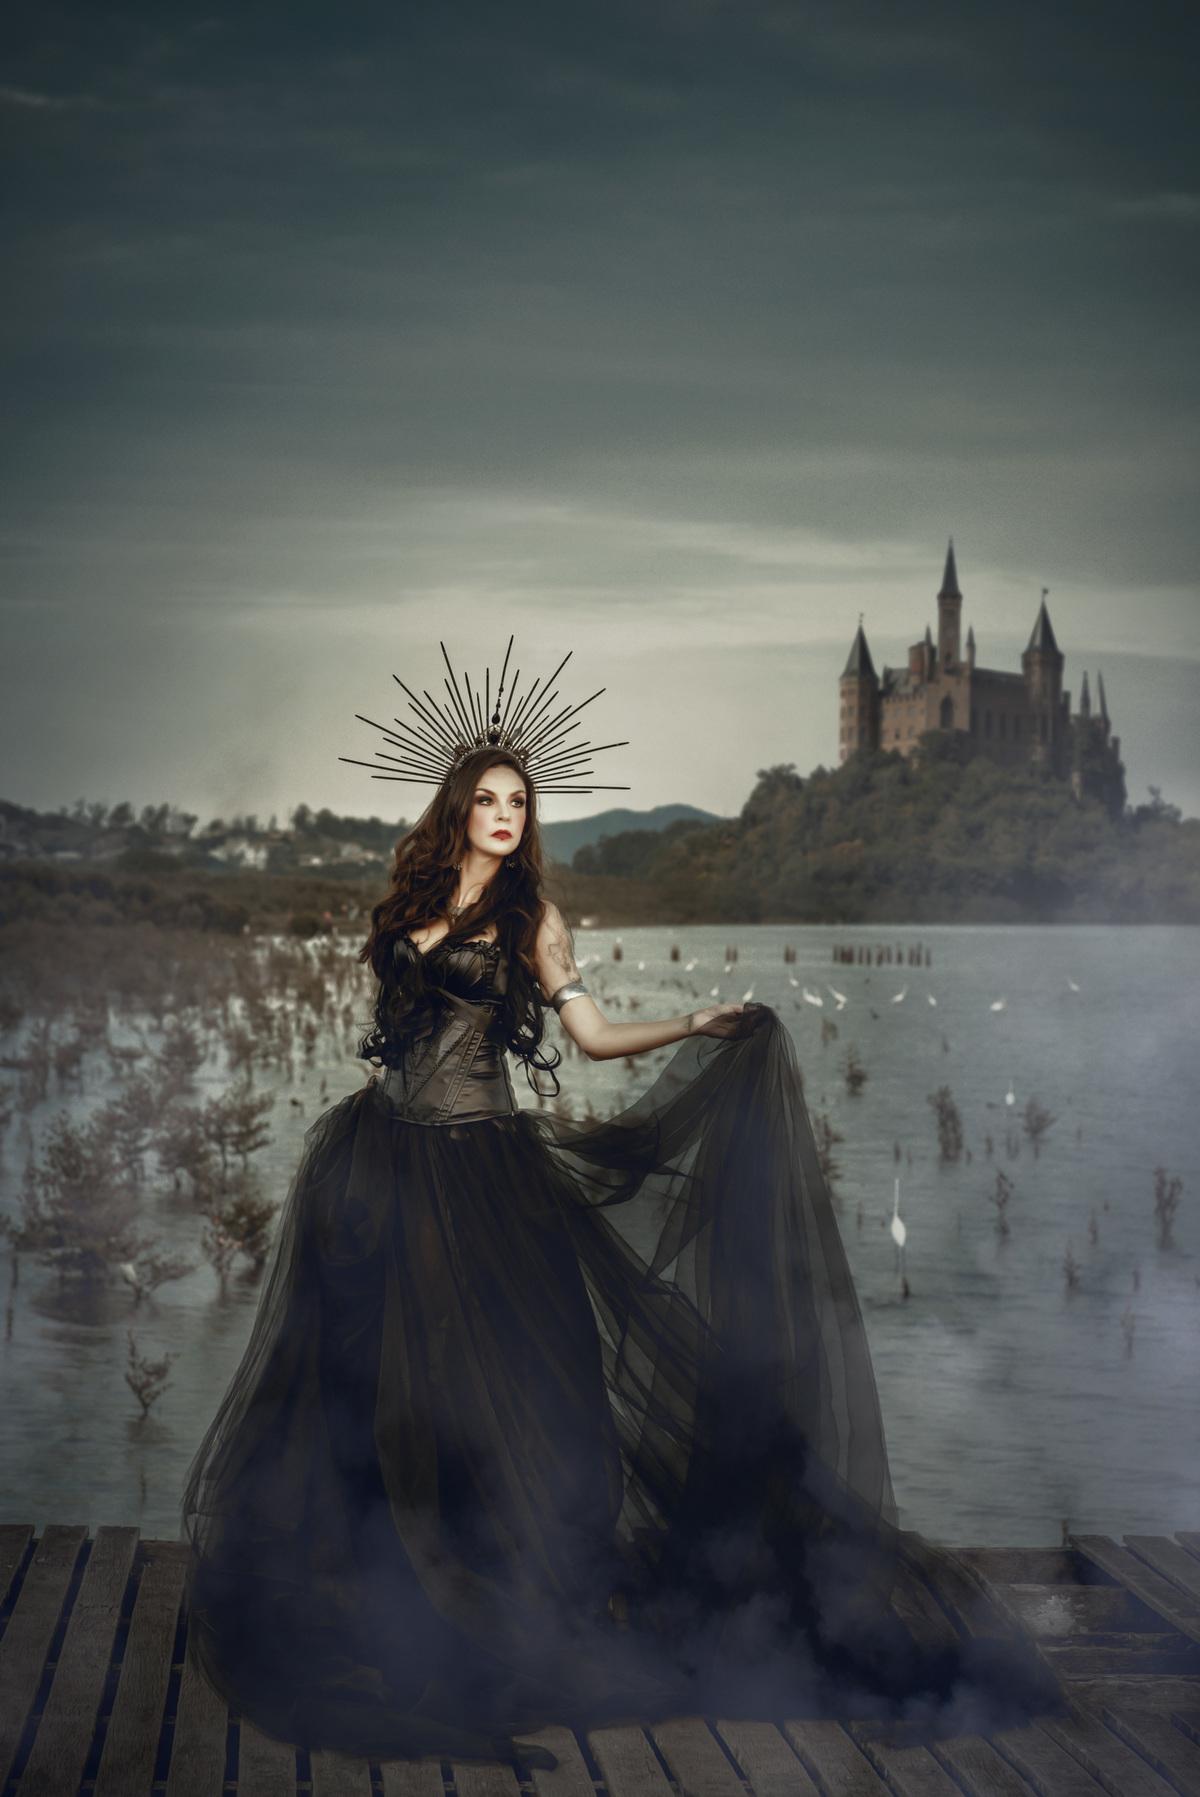 Imagem capa - Ensaio fotográfico artístico - Danielle Cesar por Roberta Guido